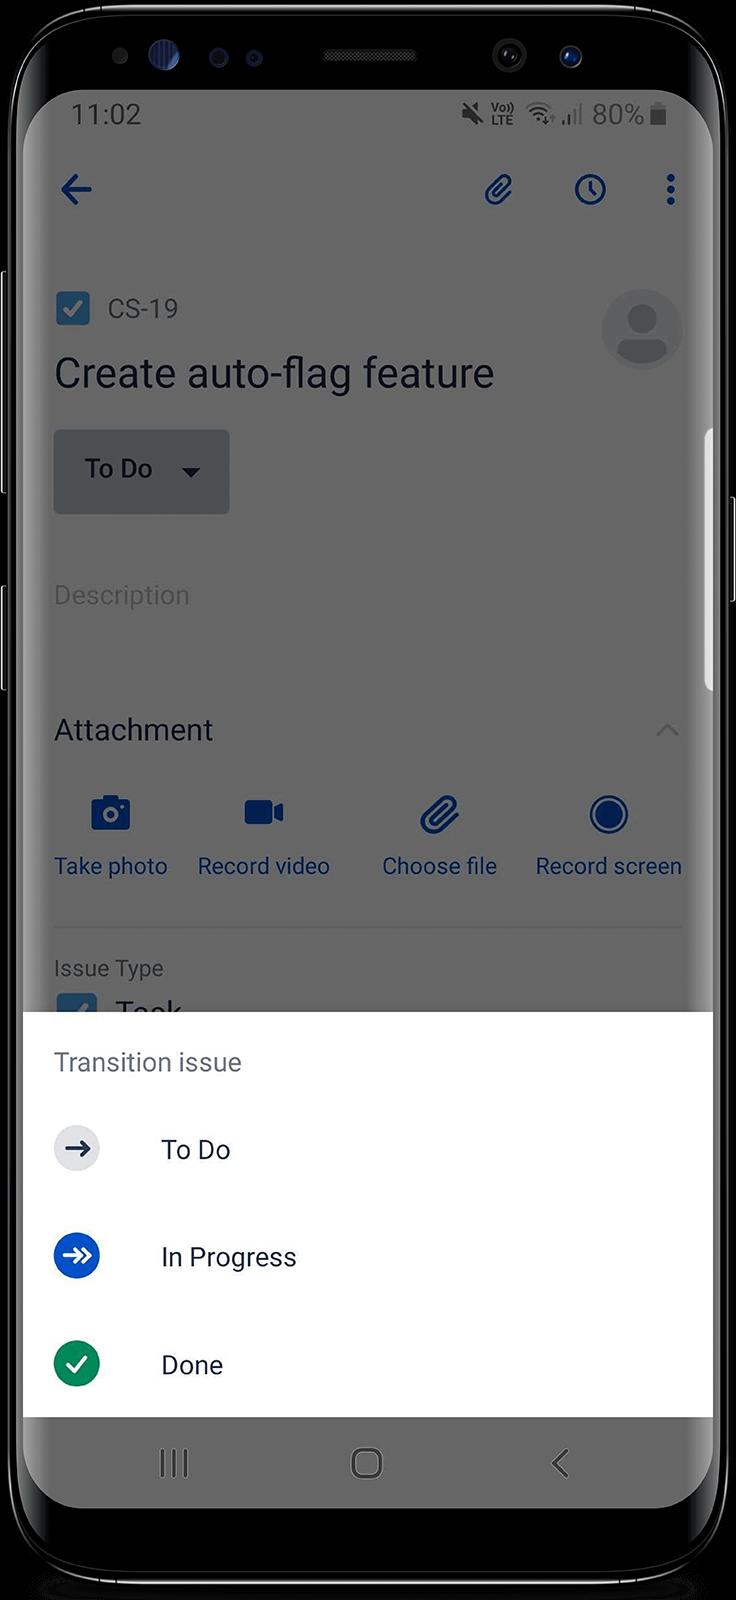 Ausgeklapptes Drop-down-Menü in der mobilen Jira Cloud-App